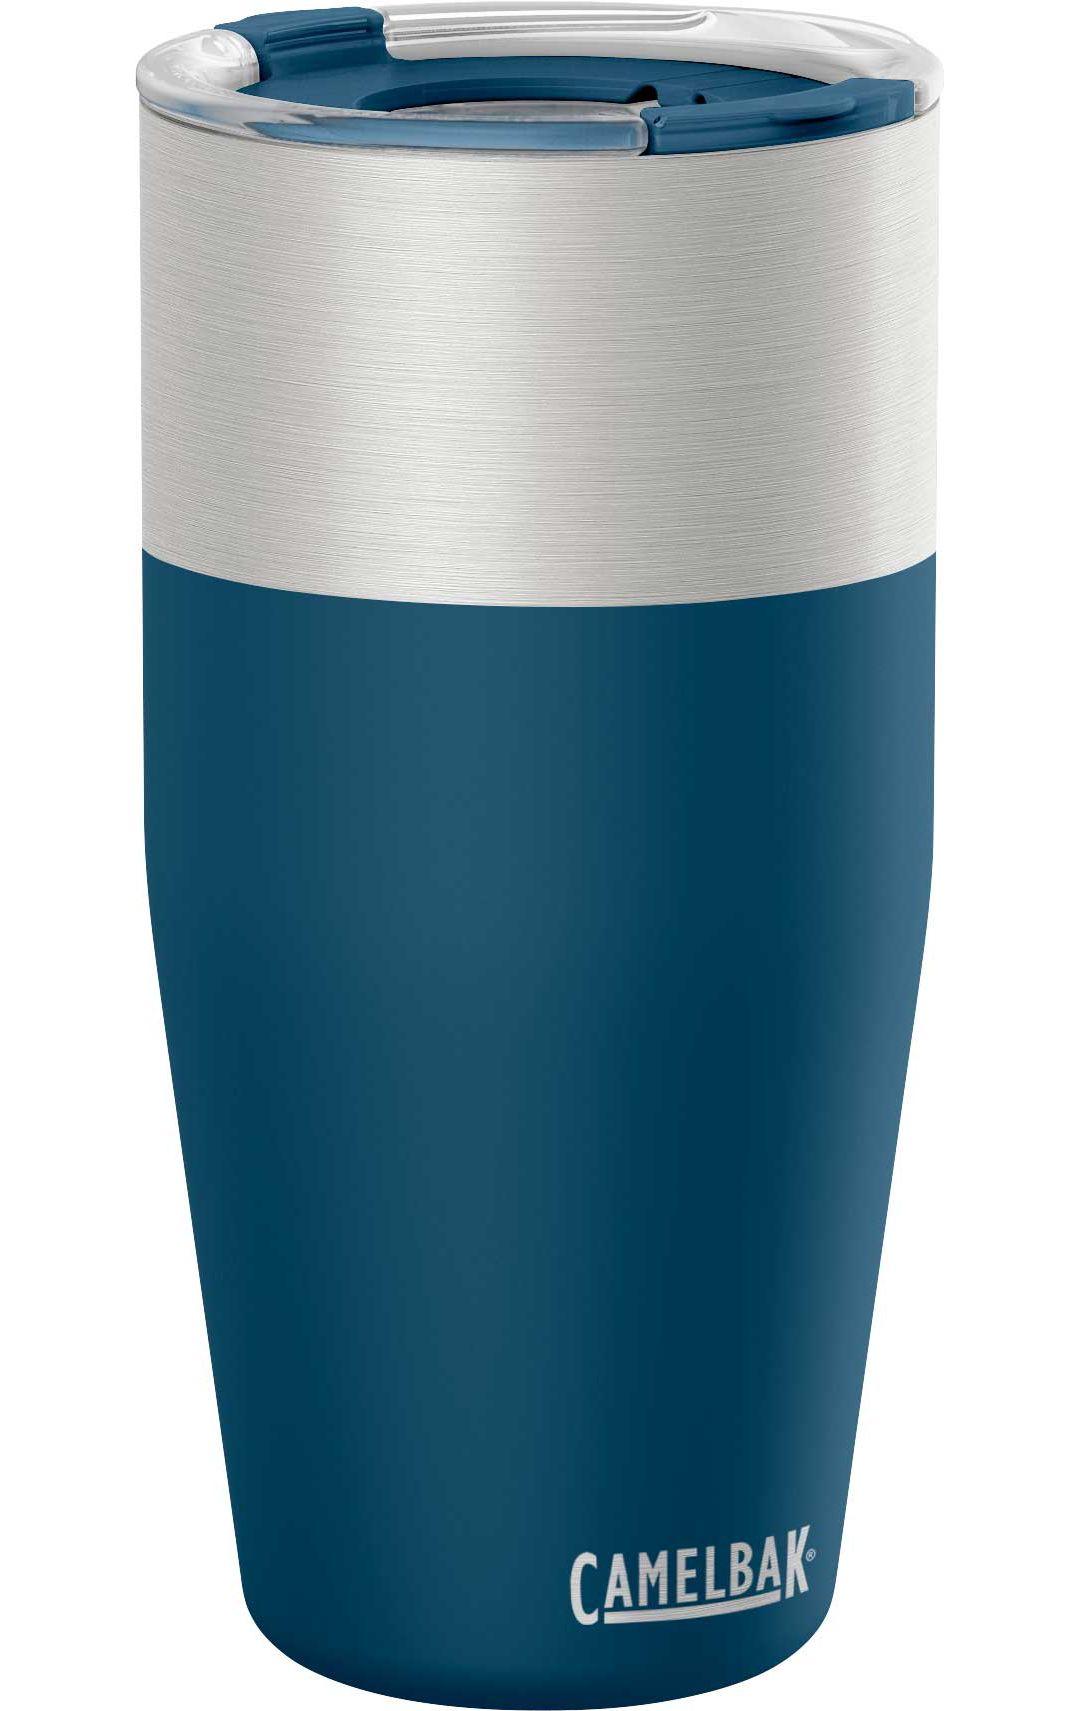 4c0cd212b8b Camelbak Kickback 20 oz. Vacuum Insulated Tumbler | DICK'S Sporting ...